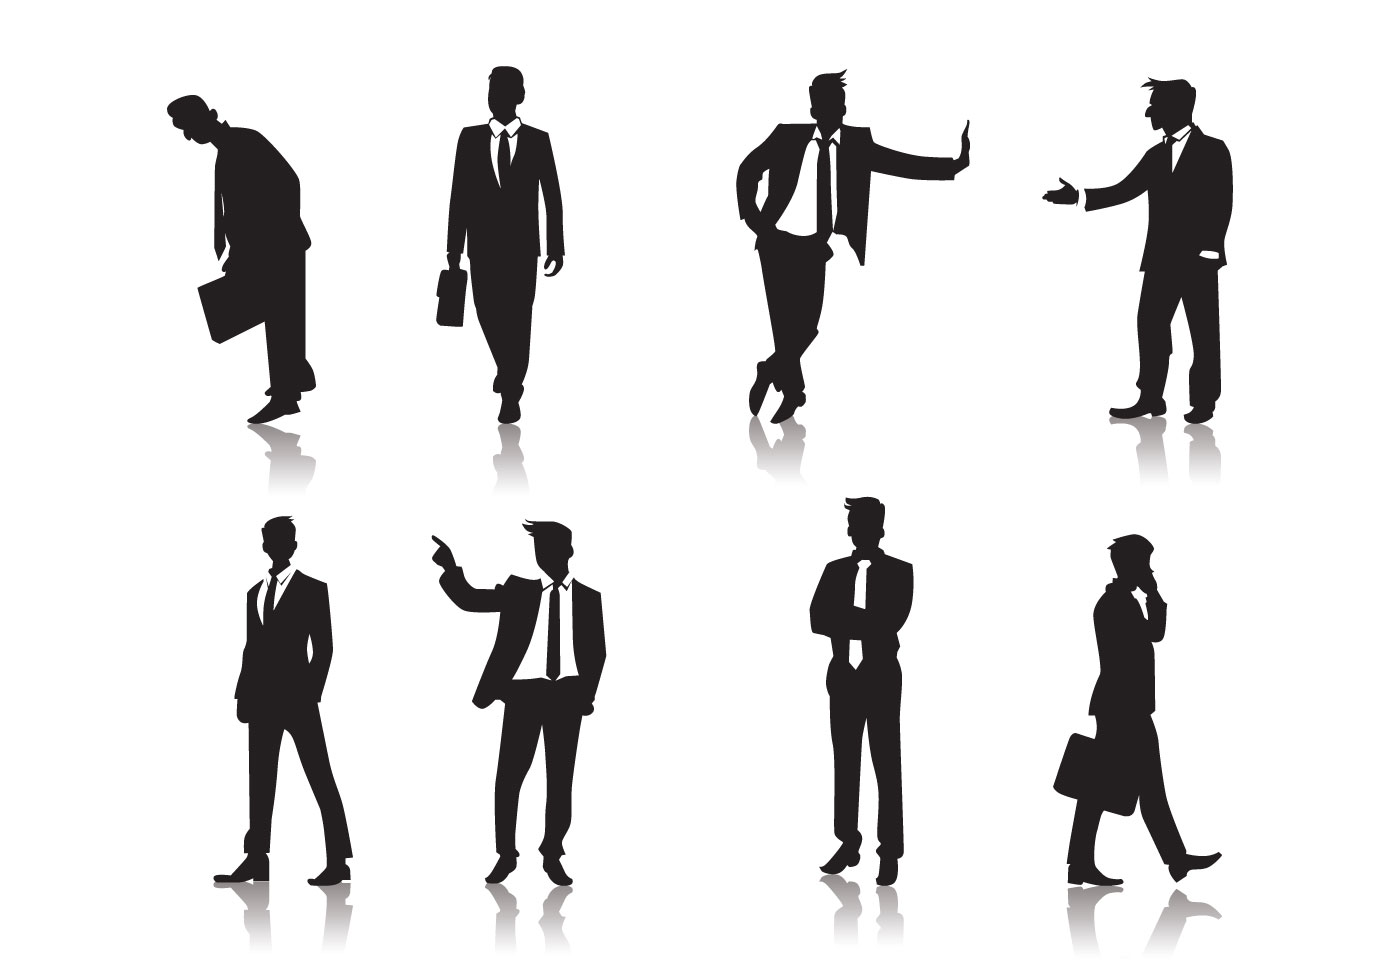 Standing Men People Silhouettes Vector